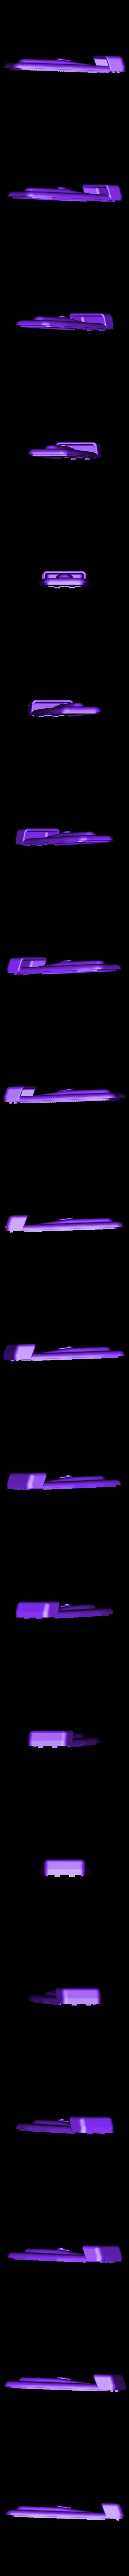 eolienne_2_nacelle_sup.STL Download free STL file Eolienne Wind turbine • 3D printing model, lulu3Dbuilder